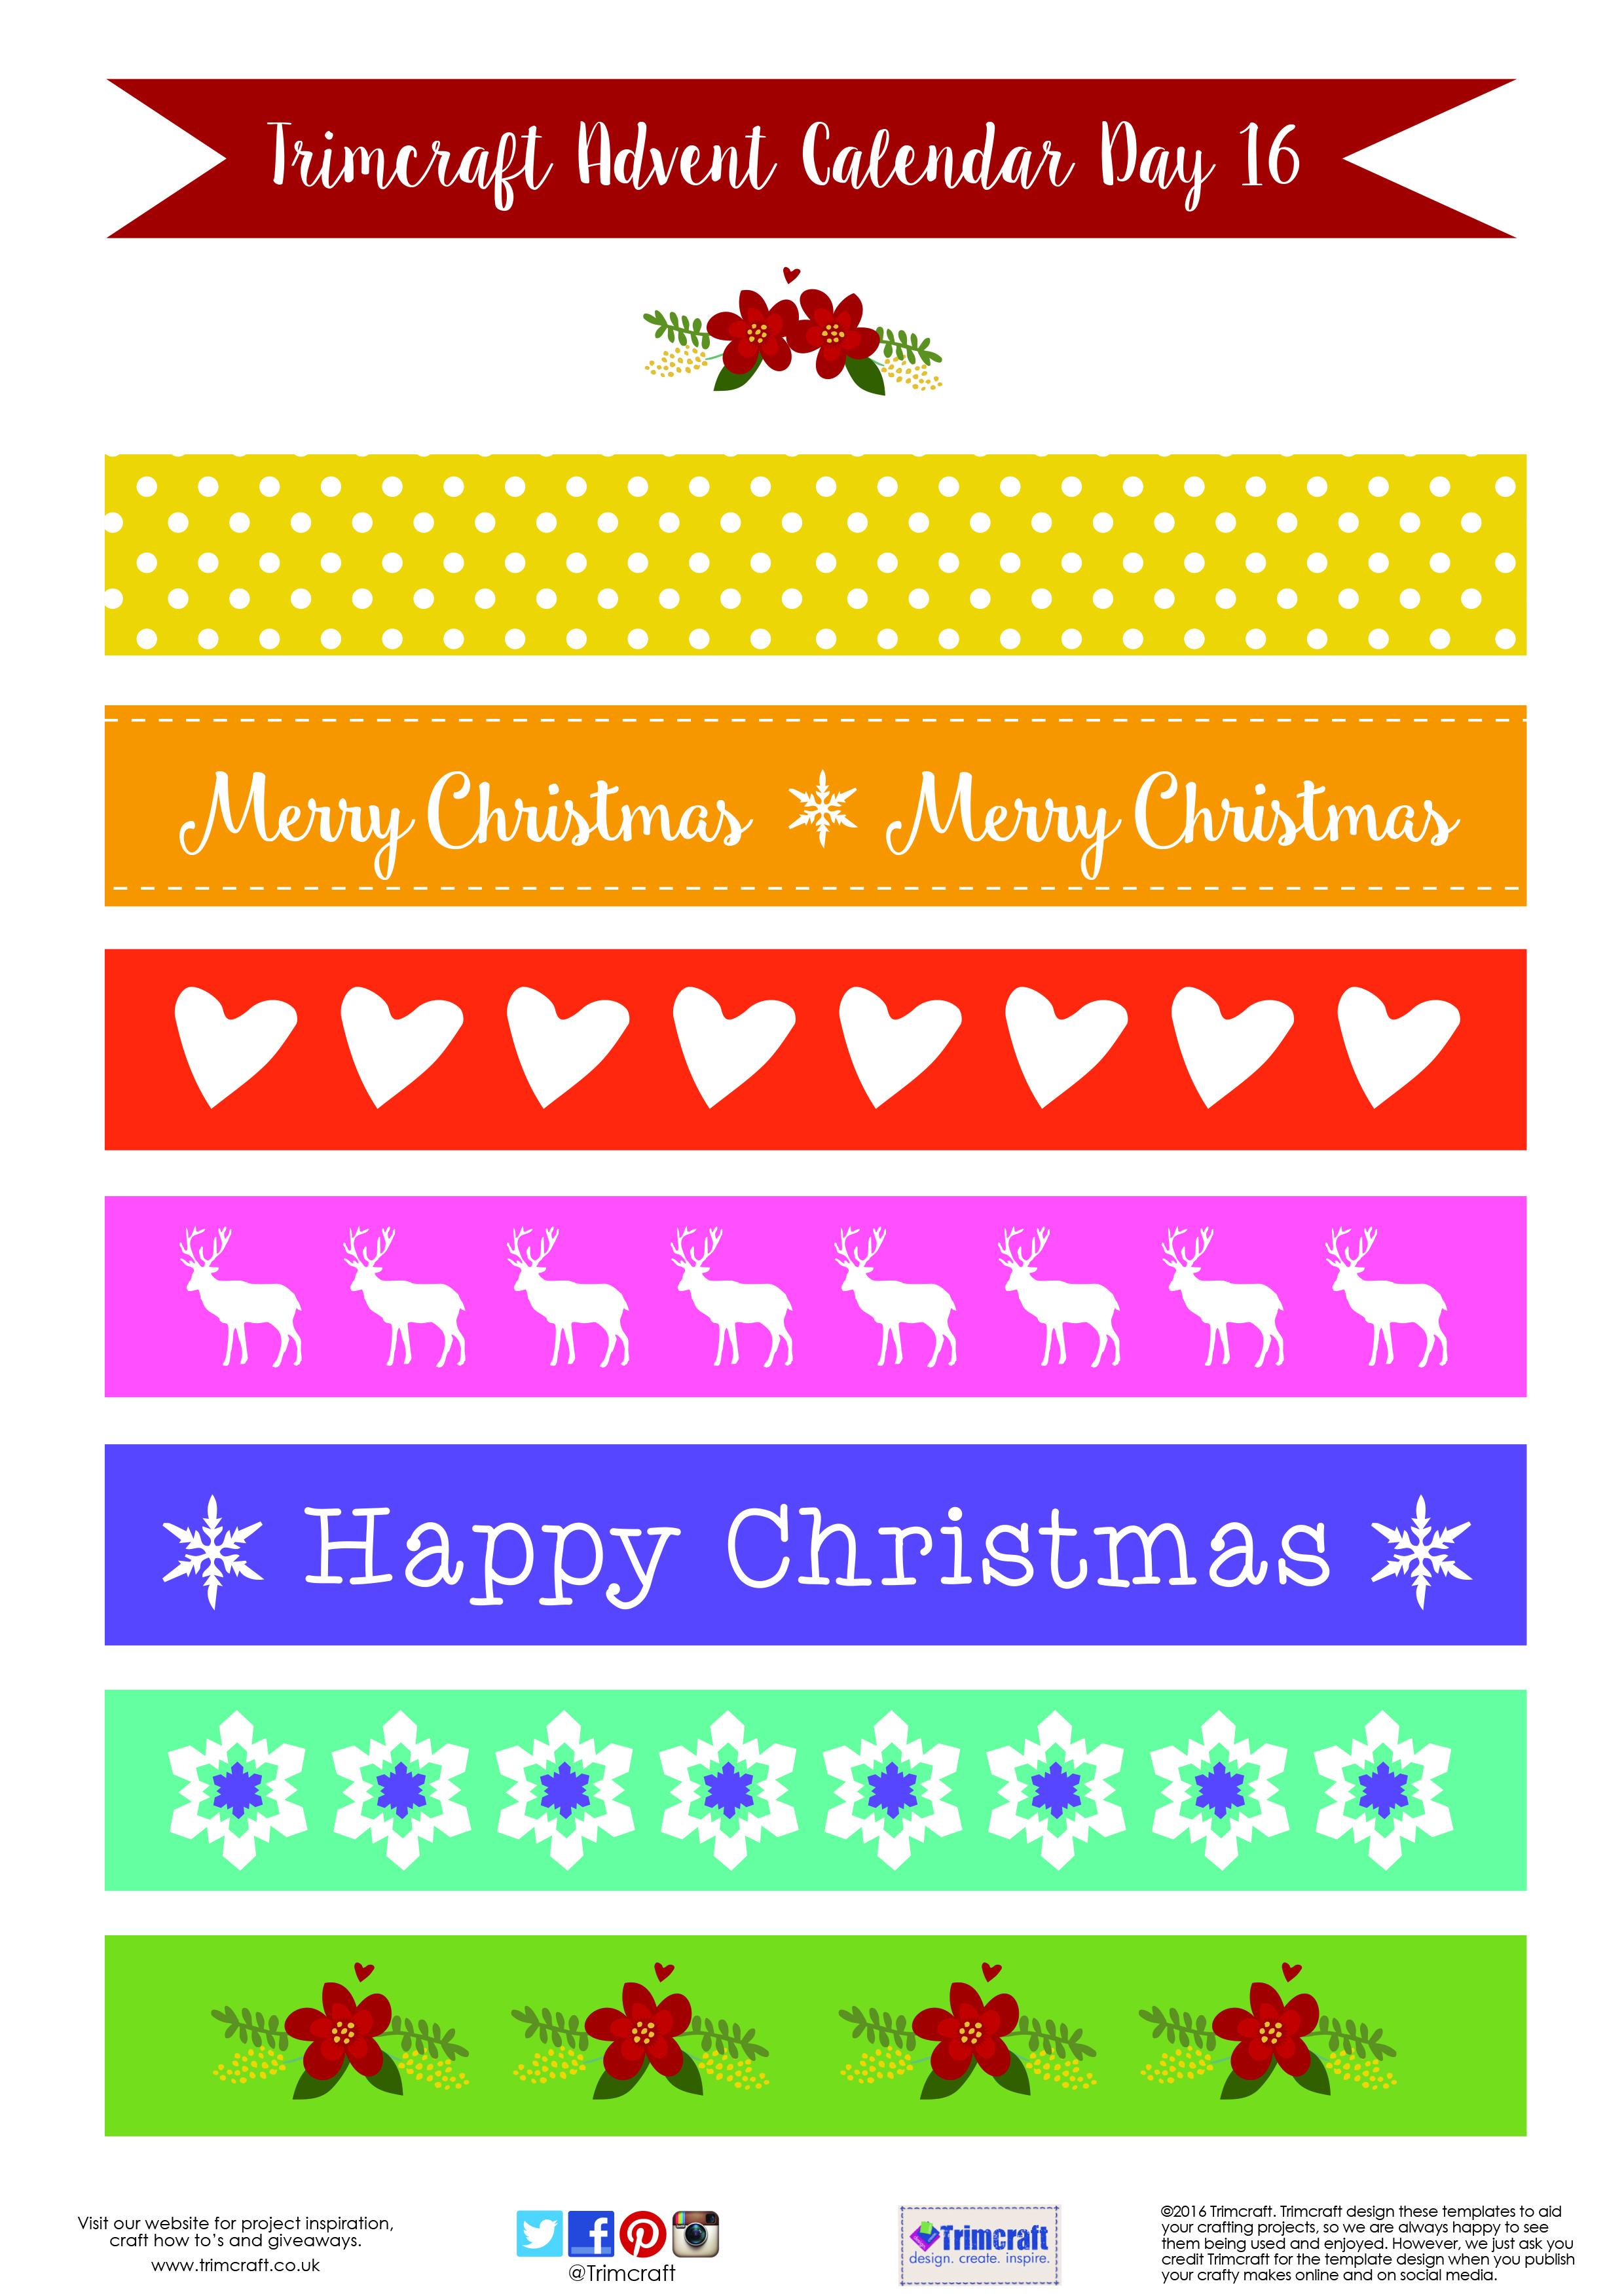 Free Printable Craft Templates | The Craft Blog within Christmas Calendar Printable Template